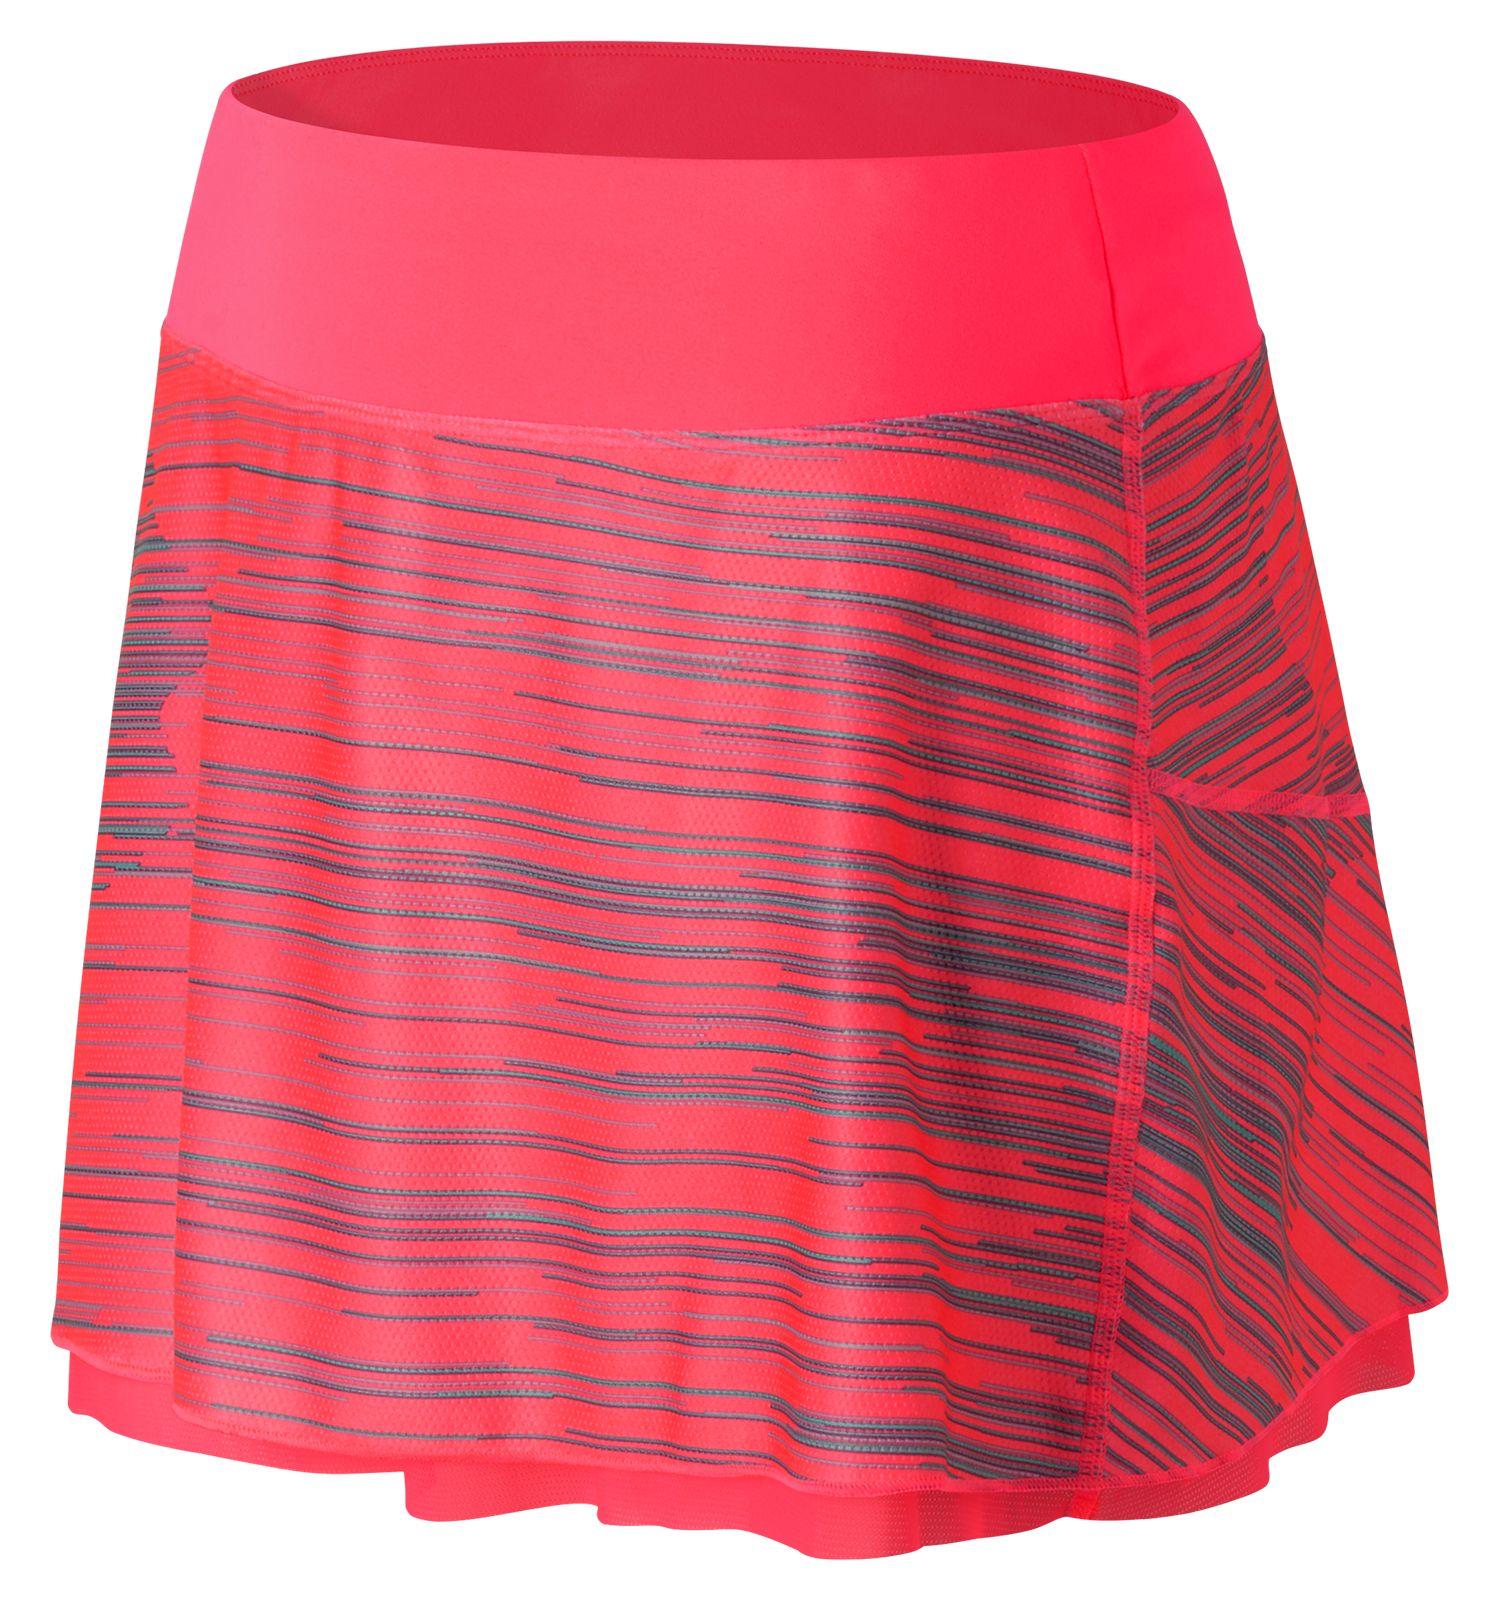 New Balance Rosewater Reversible Skirt Womens Pink